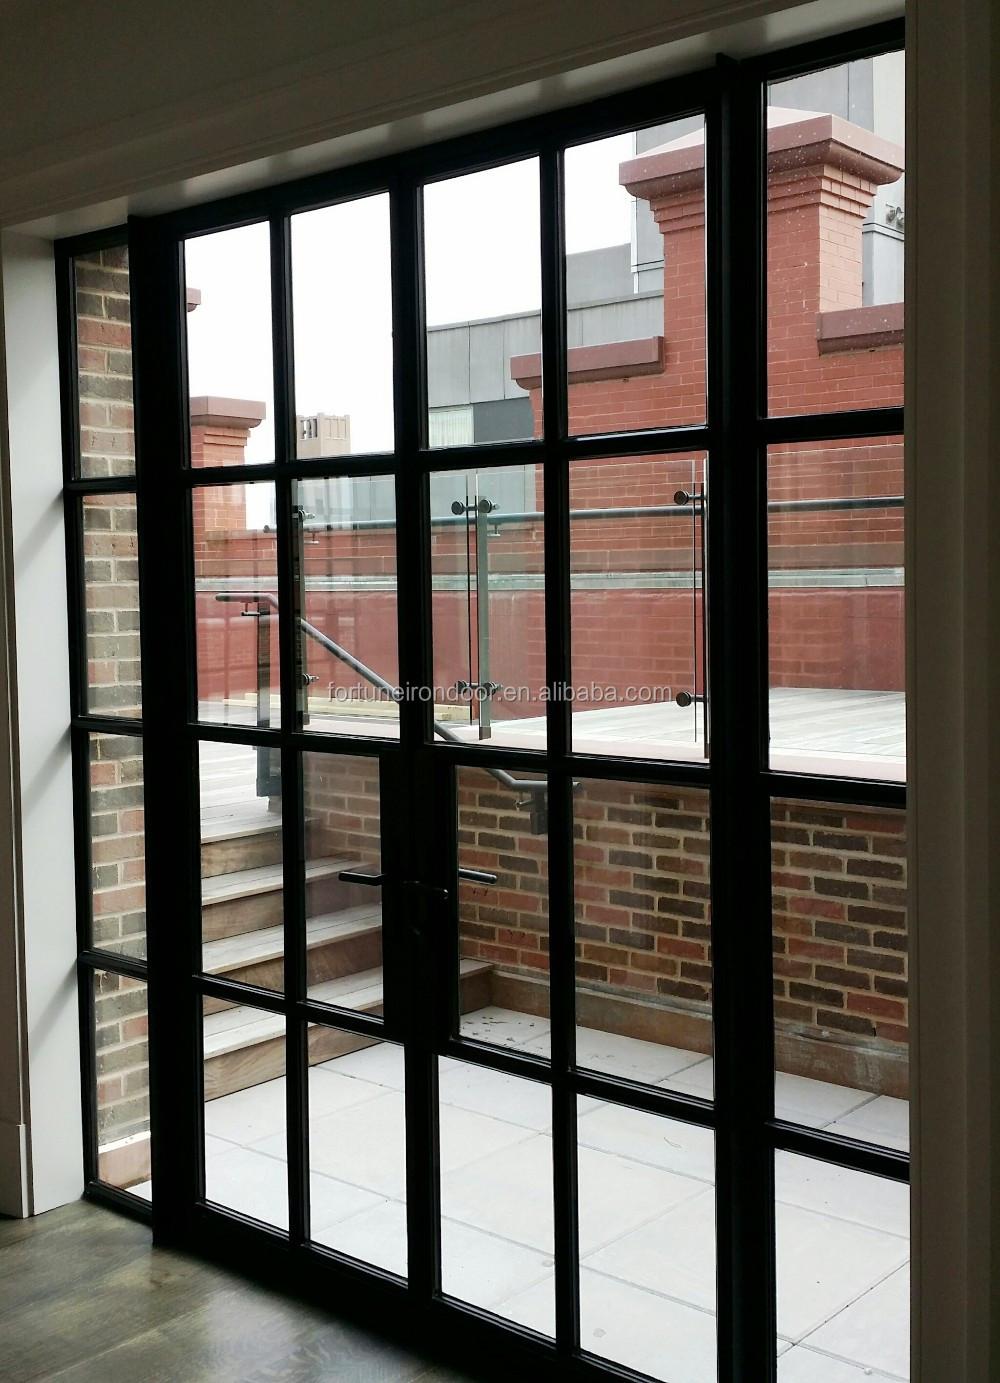 Thermally Broken Hot Rolled Steel Window Windows And Doors Made ...